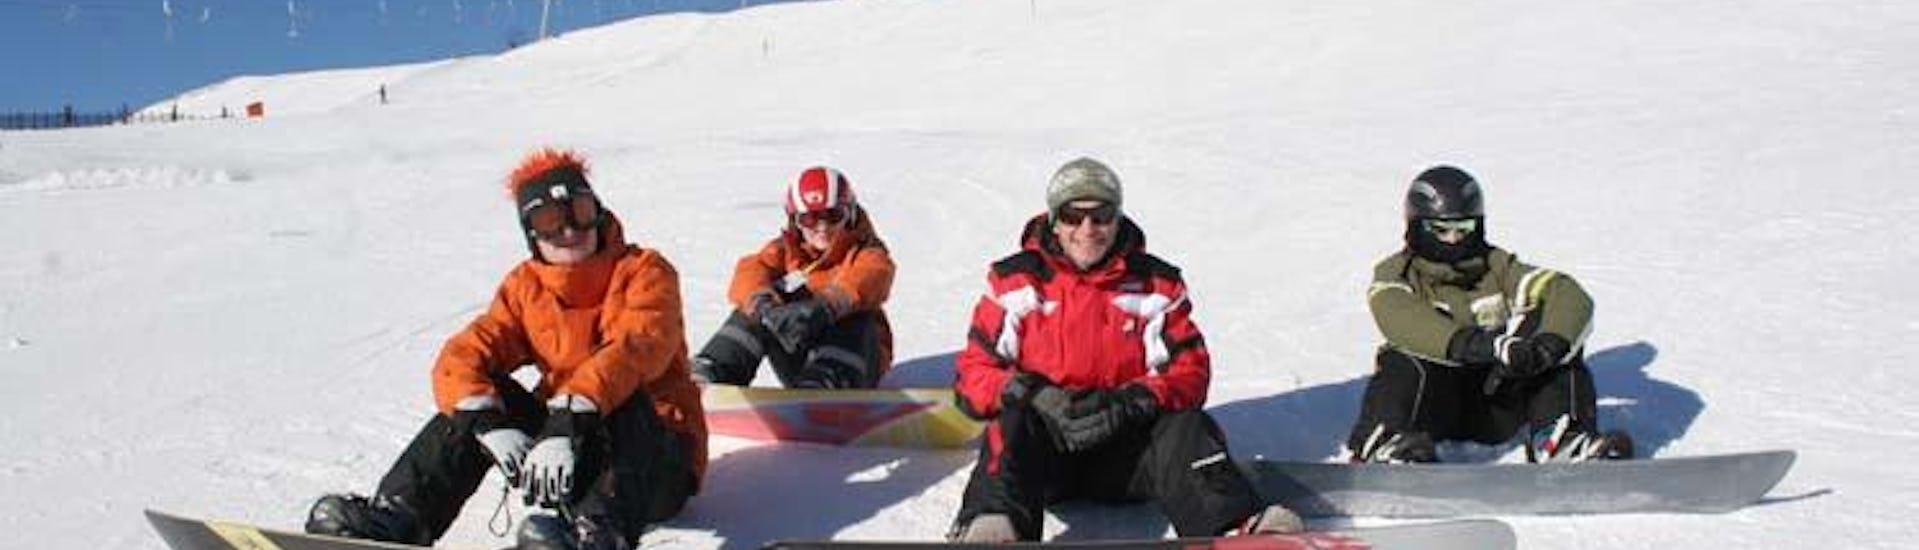 Private Snowboard Gruppenkurse - Alle Levels & Altersgruppen